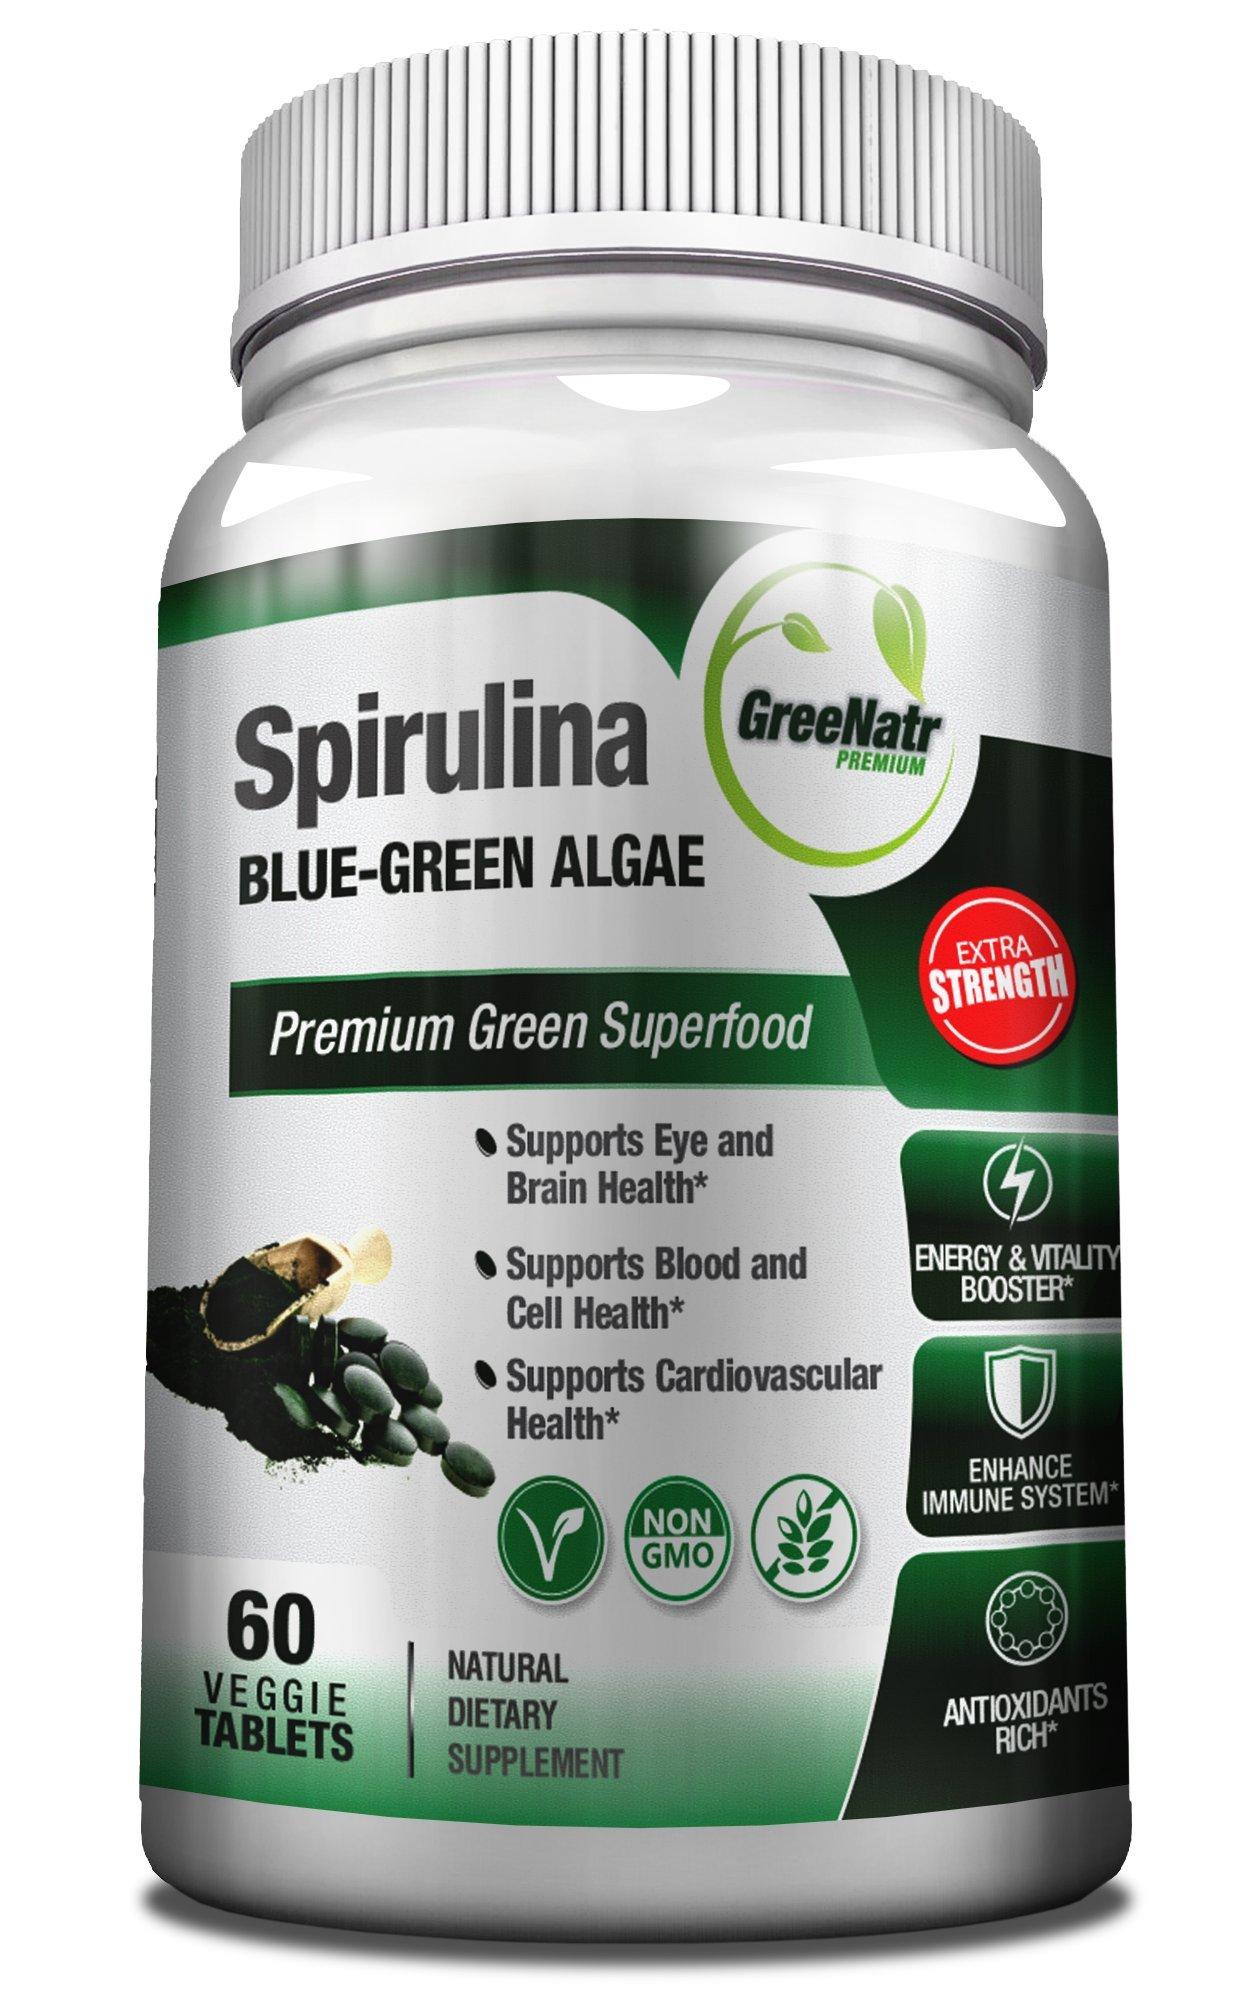 Spirulina Tablets - Blue Green Algae Pills - Veggie Formula / Non GMO / Gluten Free- See Spirulina Health Benefits At 1000mg Per Day - 30-Day Supply